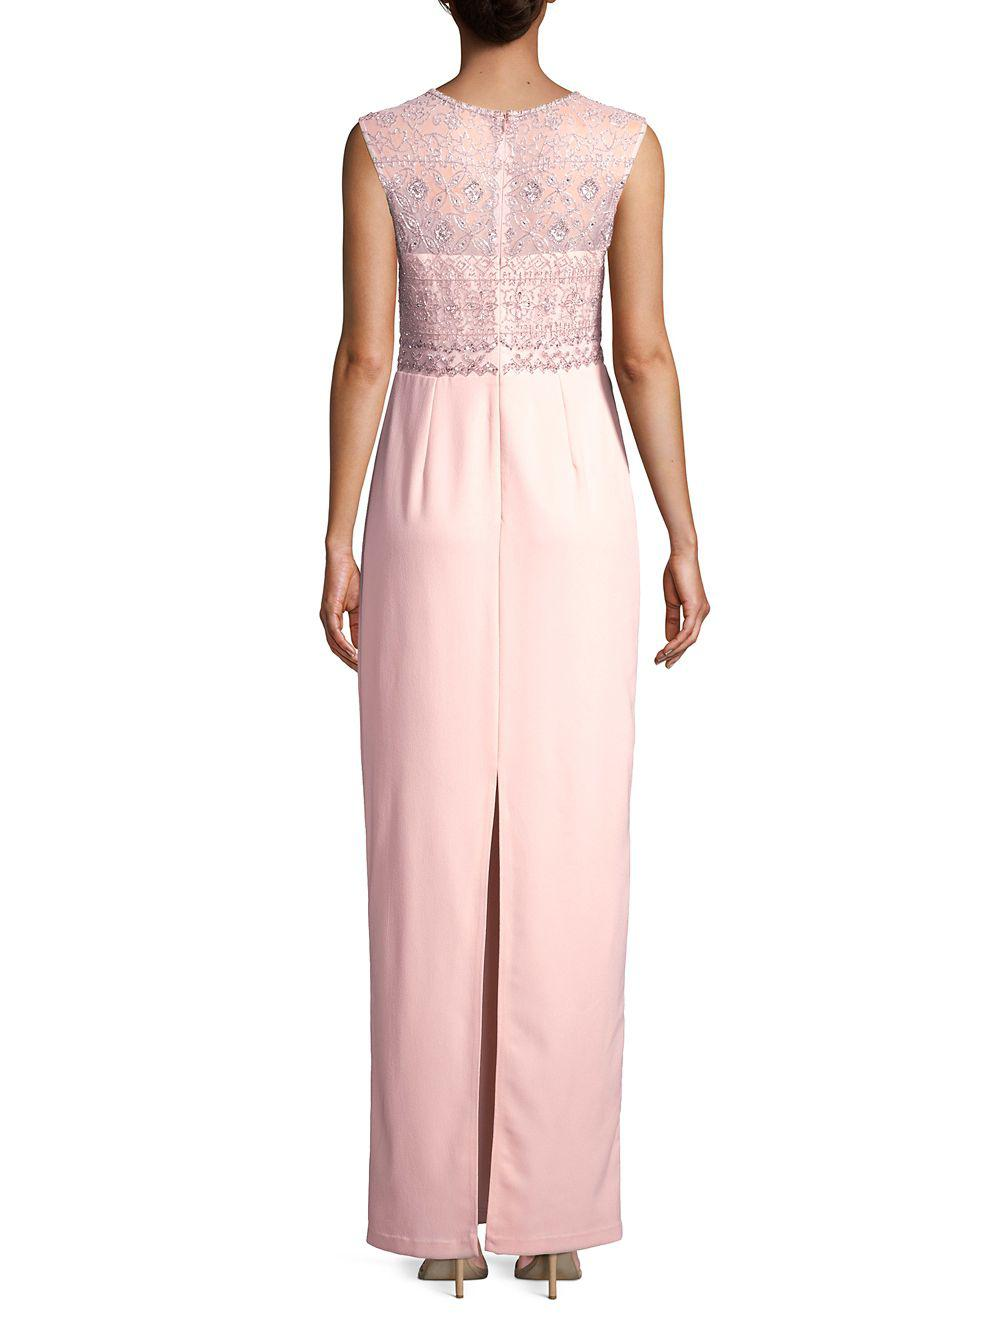 80e3aaddd9403 Adrianna Papell - Pink Beaded Sleeveless Long Dress - Lyst. View fullscreen